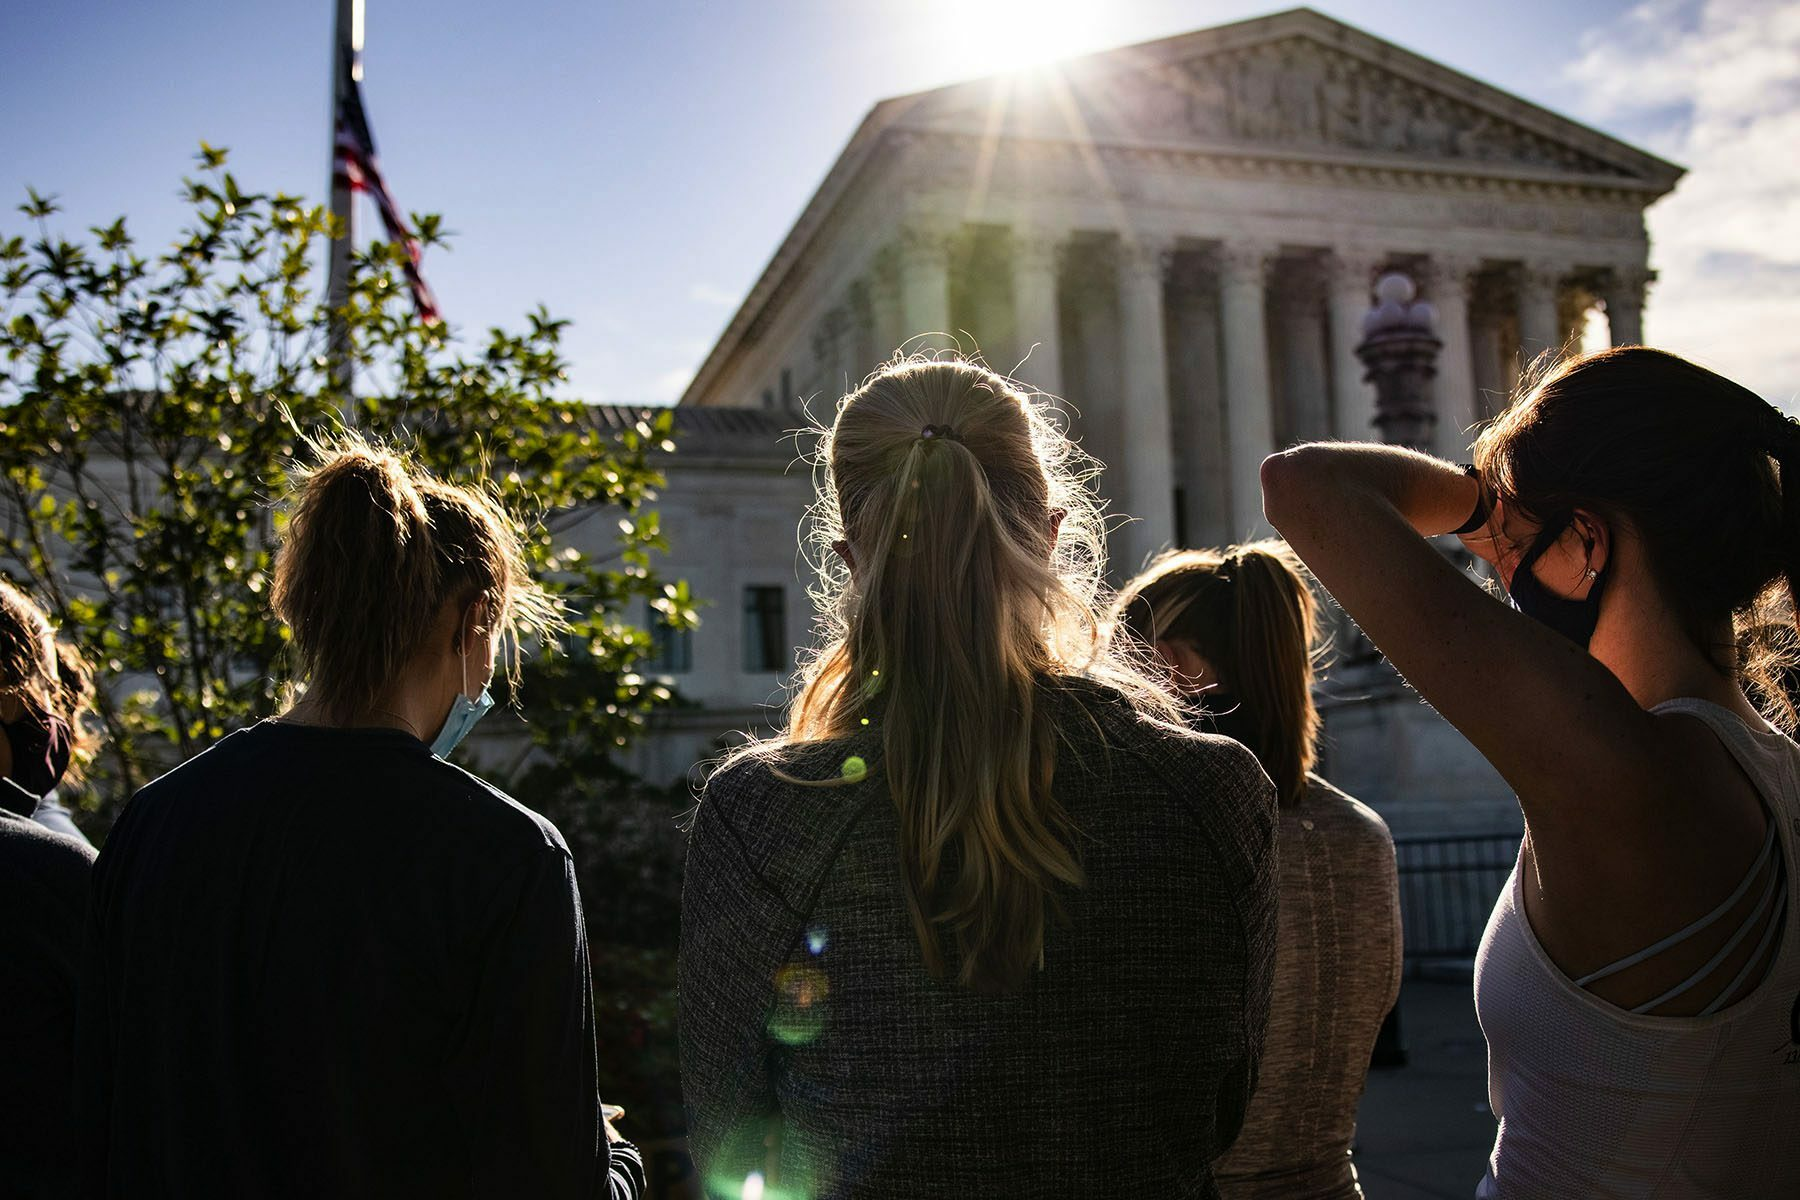 Women wearing masks stand near the U.S. Supreme Court